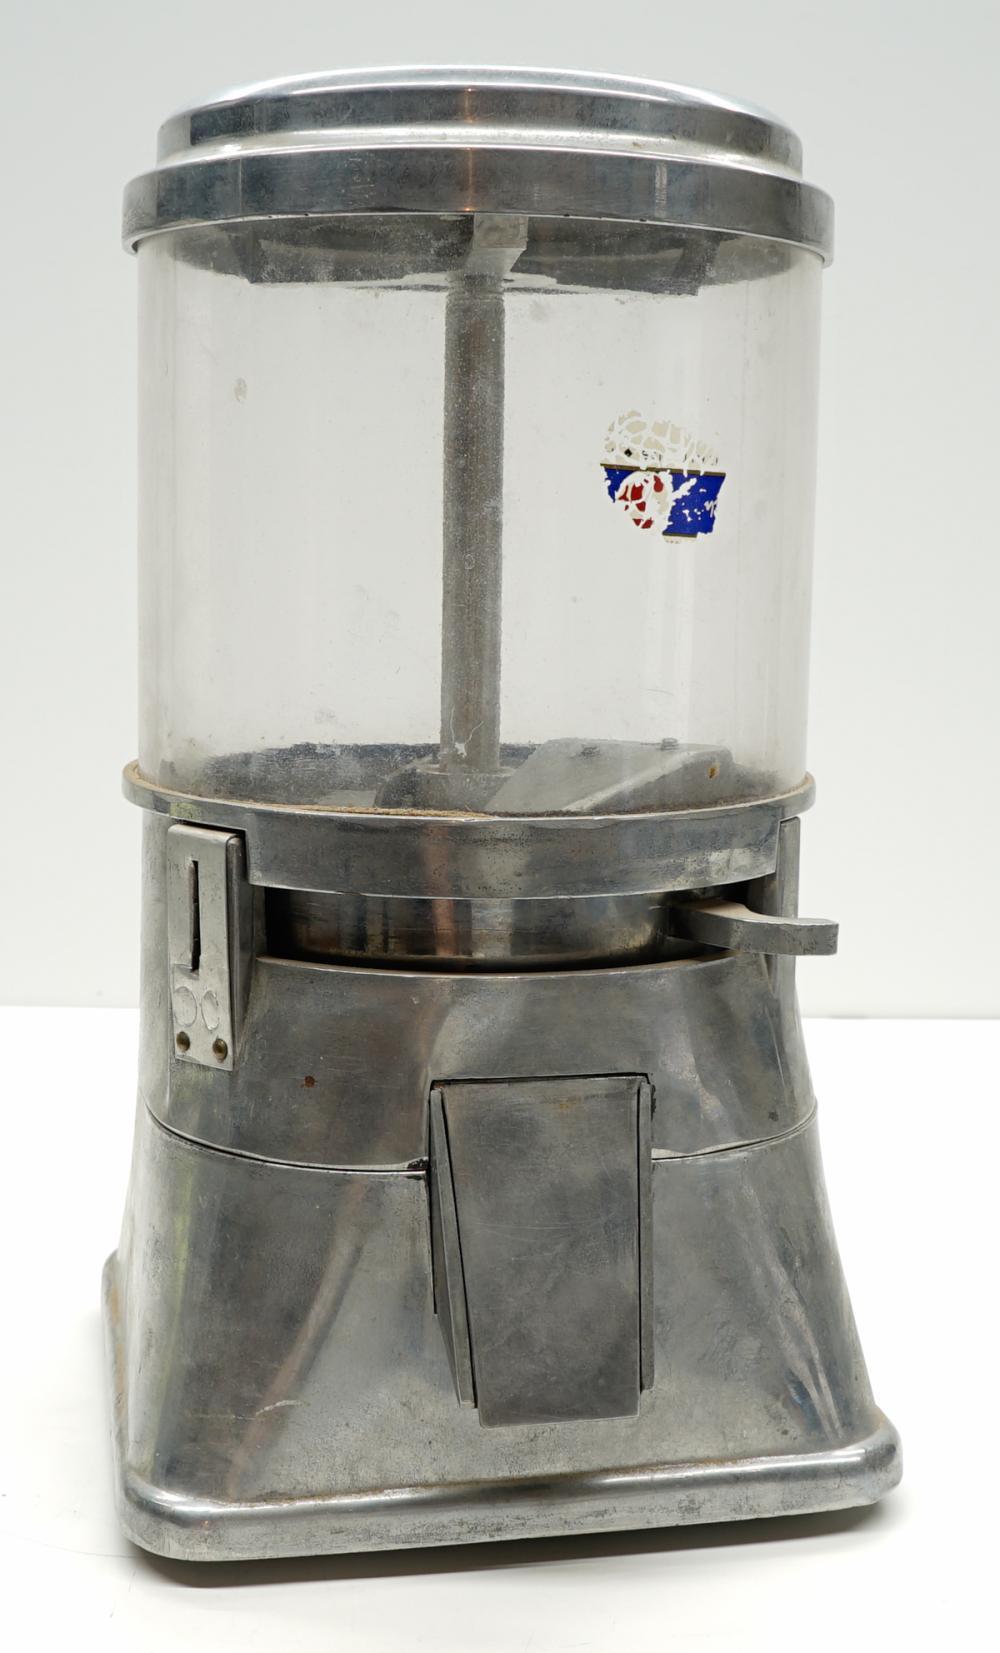 Lot 265: Vintage 5c Coin-Op Gumball Machine